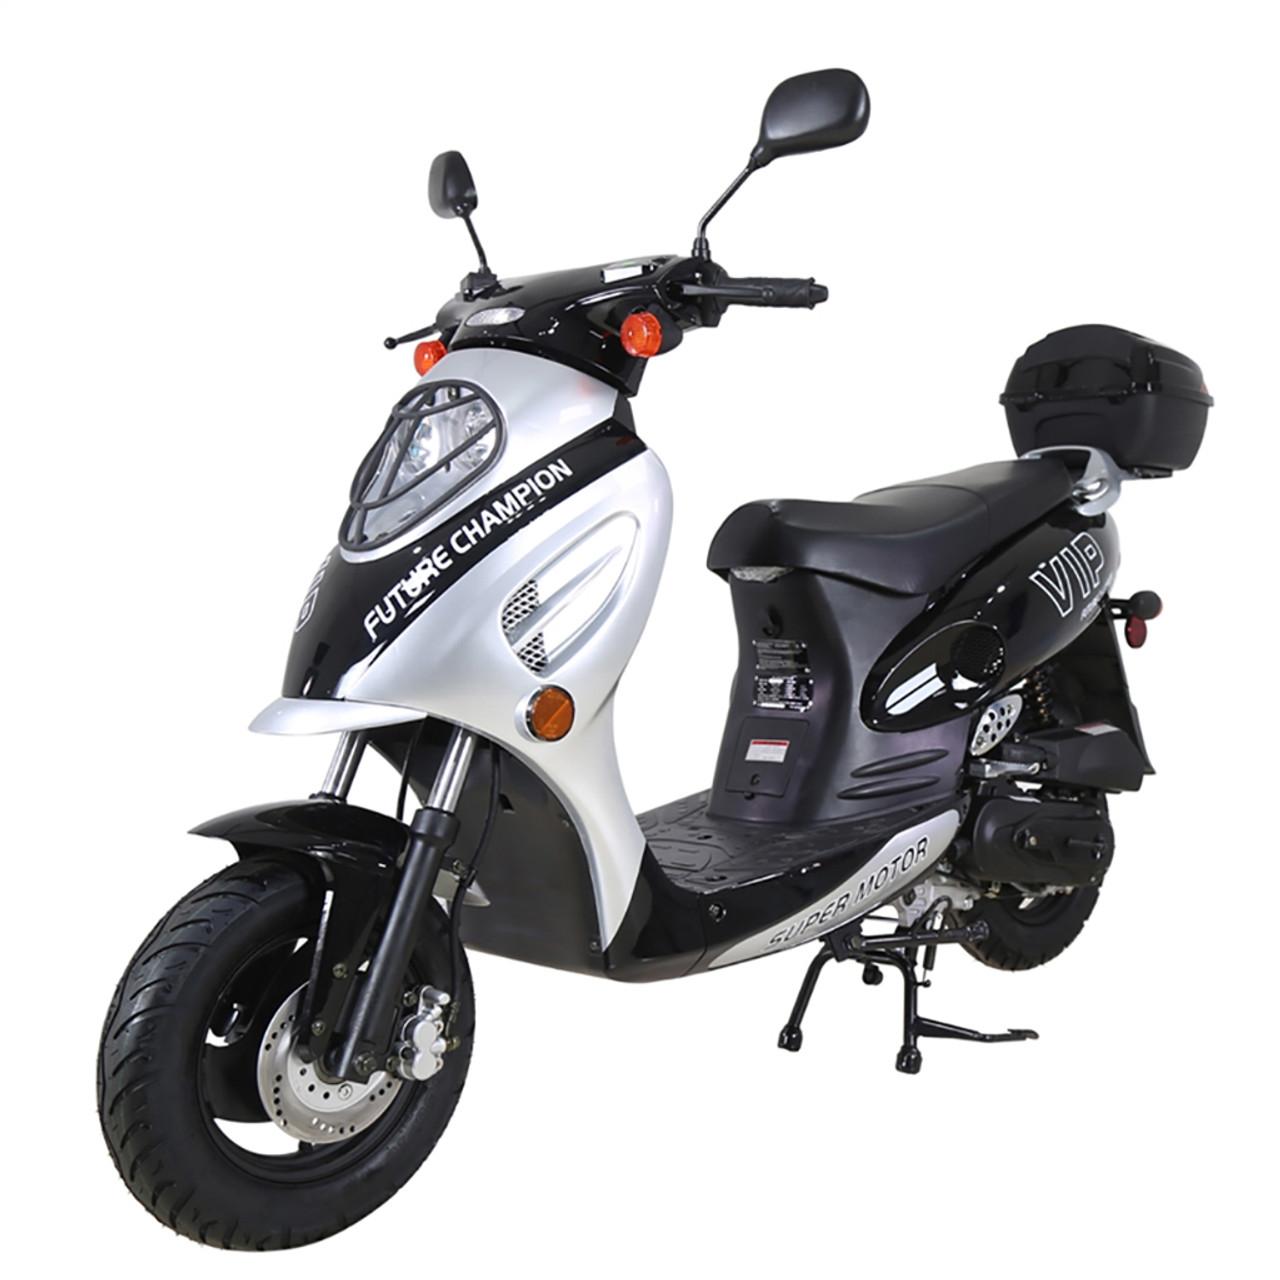 TAOTAO VIP 50cc & POWERMAX 150cc BATTERY BOX COVER LID *OEM*